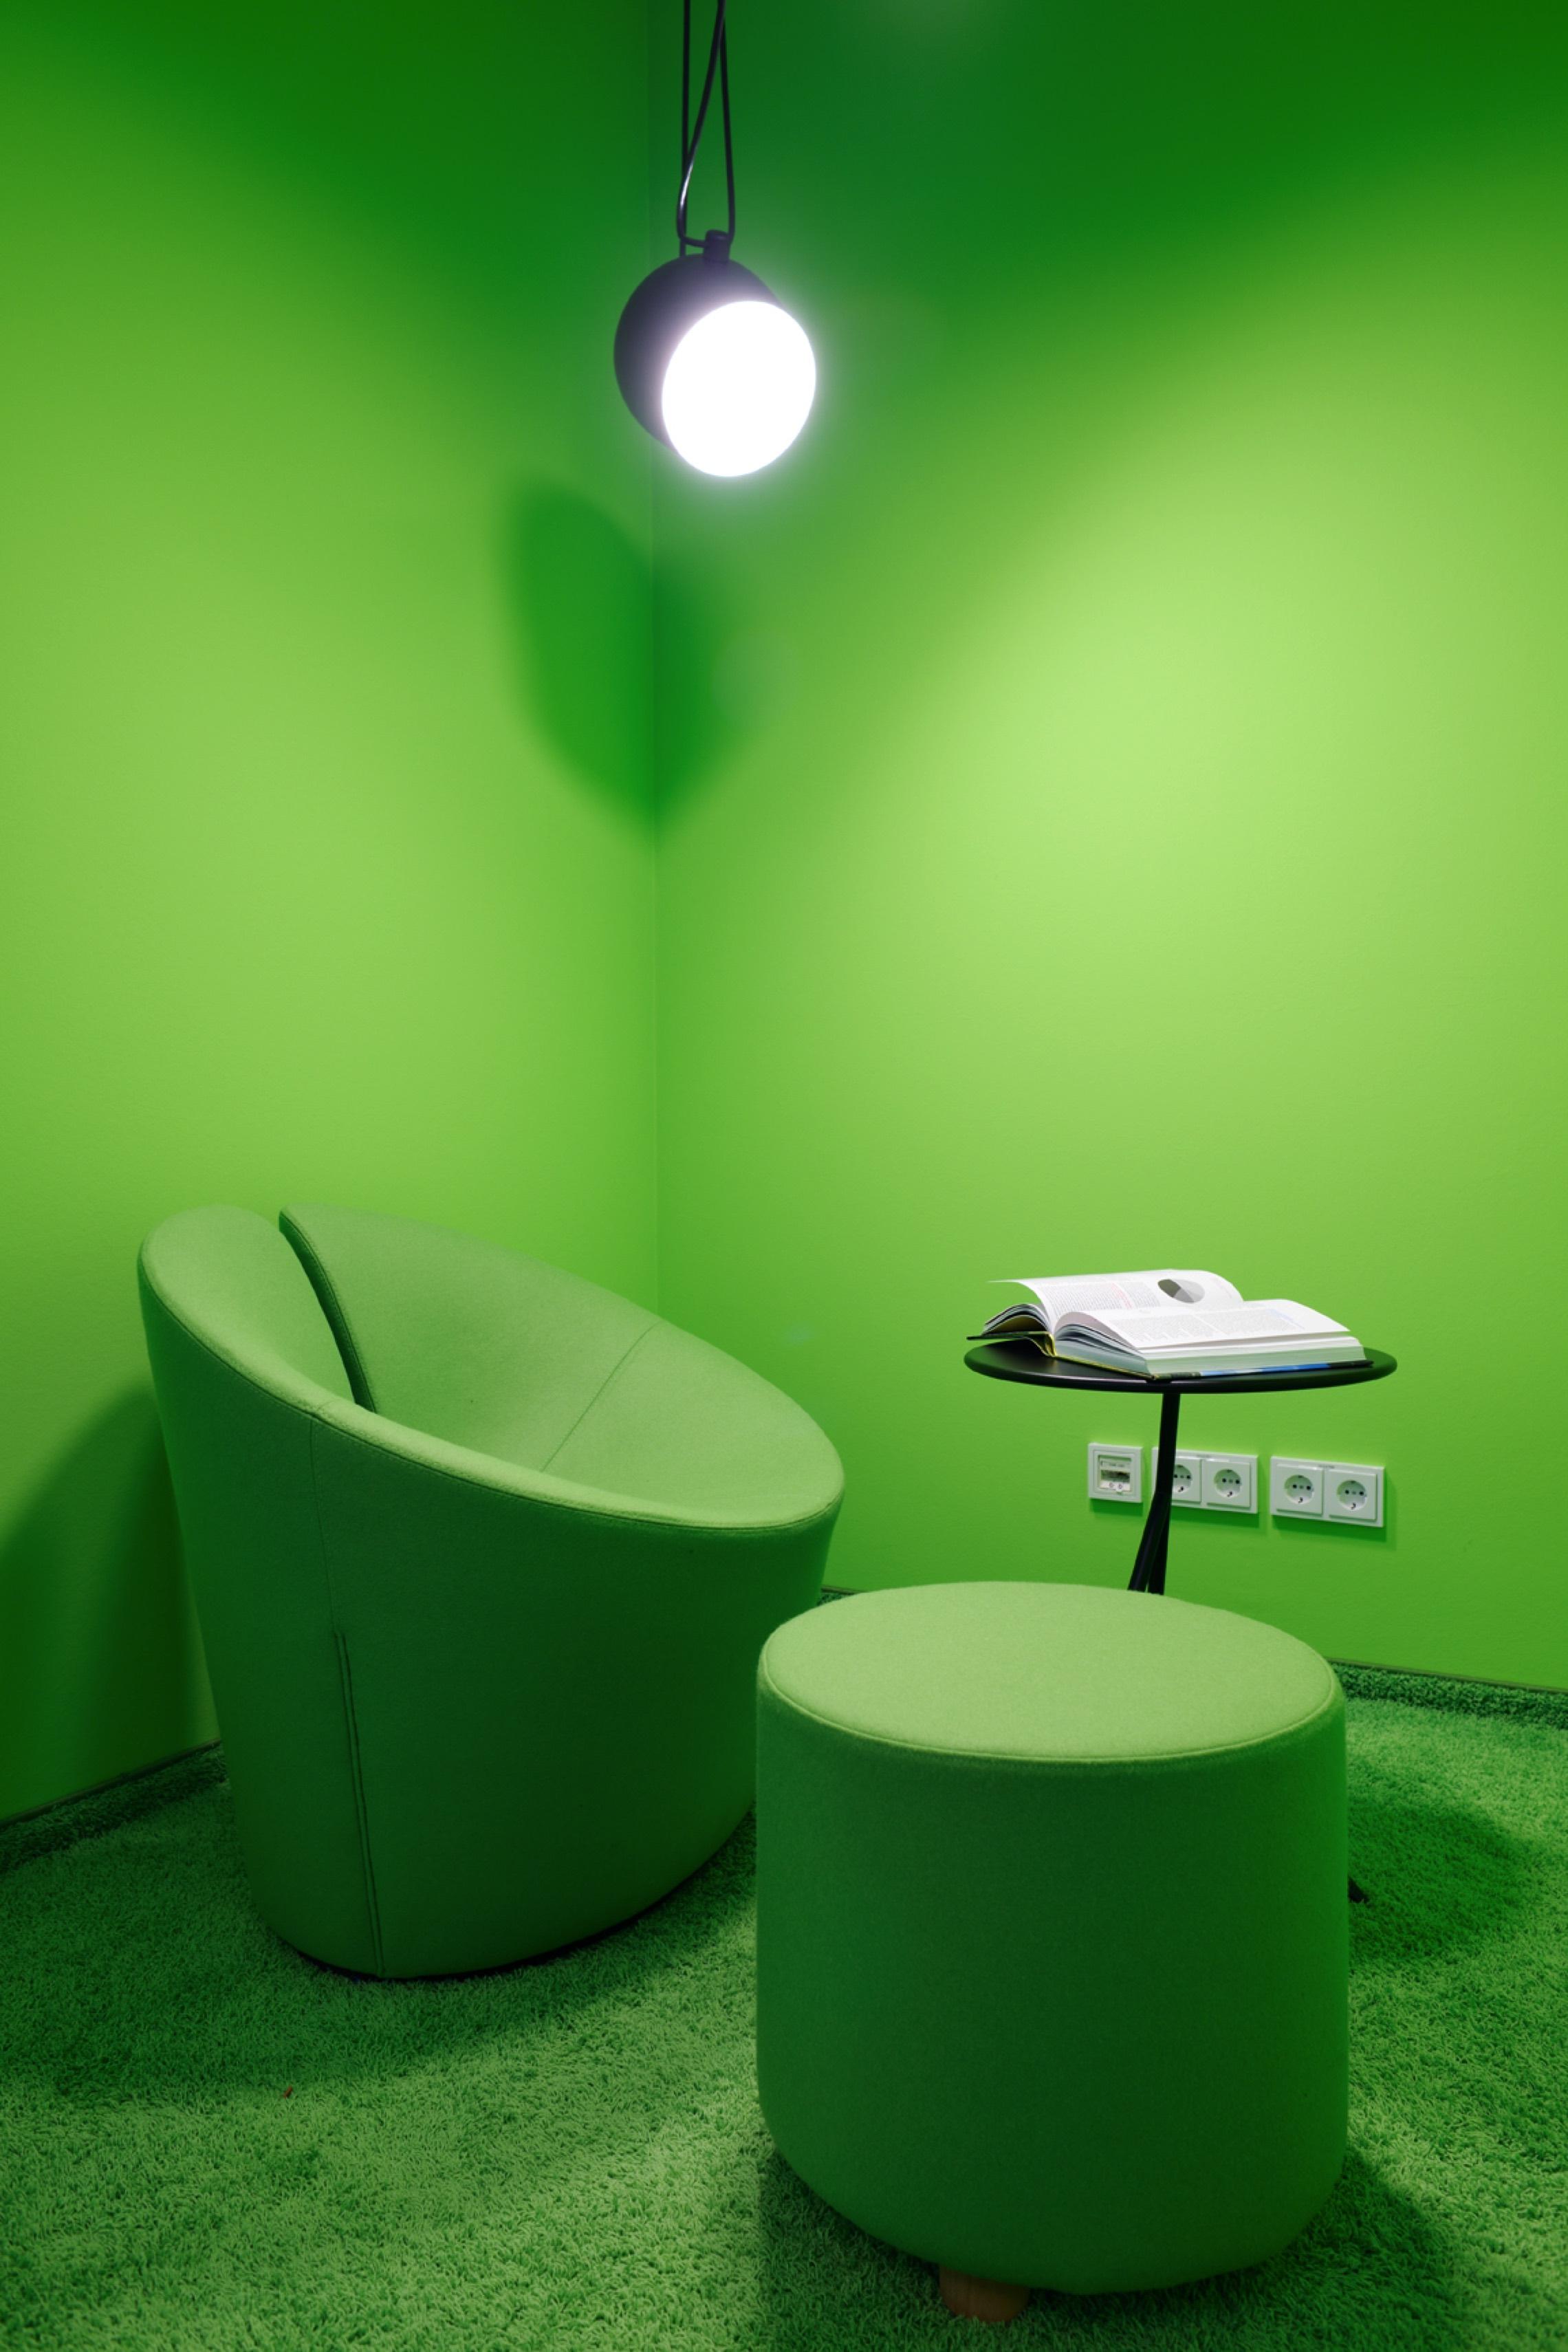 Möbel Drees drees sommer hamburg office inspiration